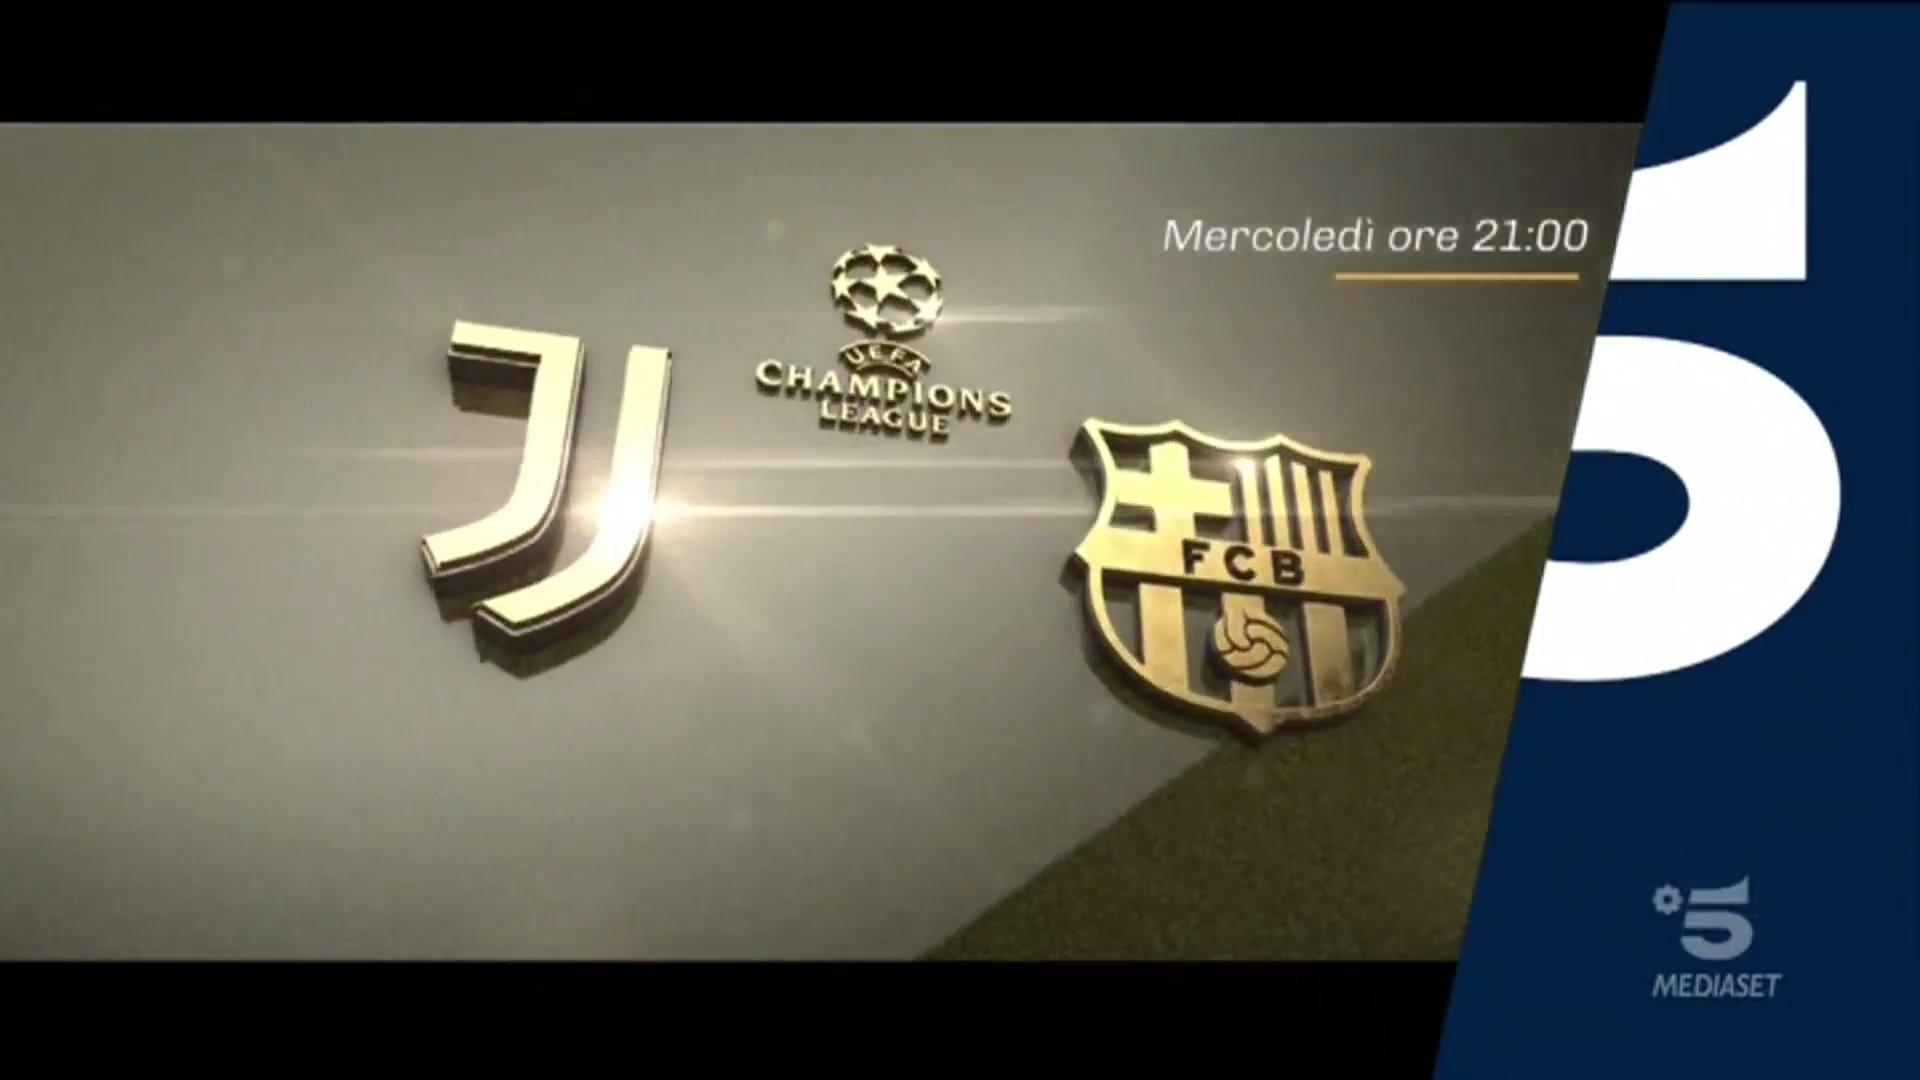 champions juventus barcellona diretta canale 5 telecronisti sport mediaset digital news barcellona diretta canale 5